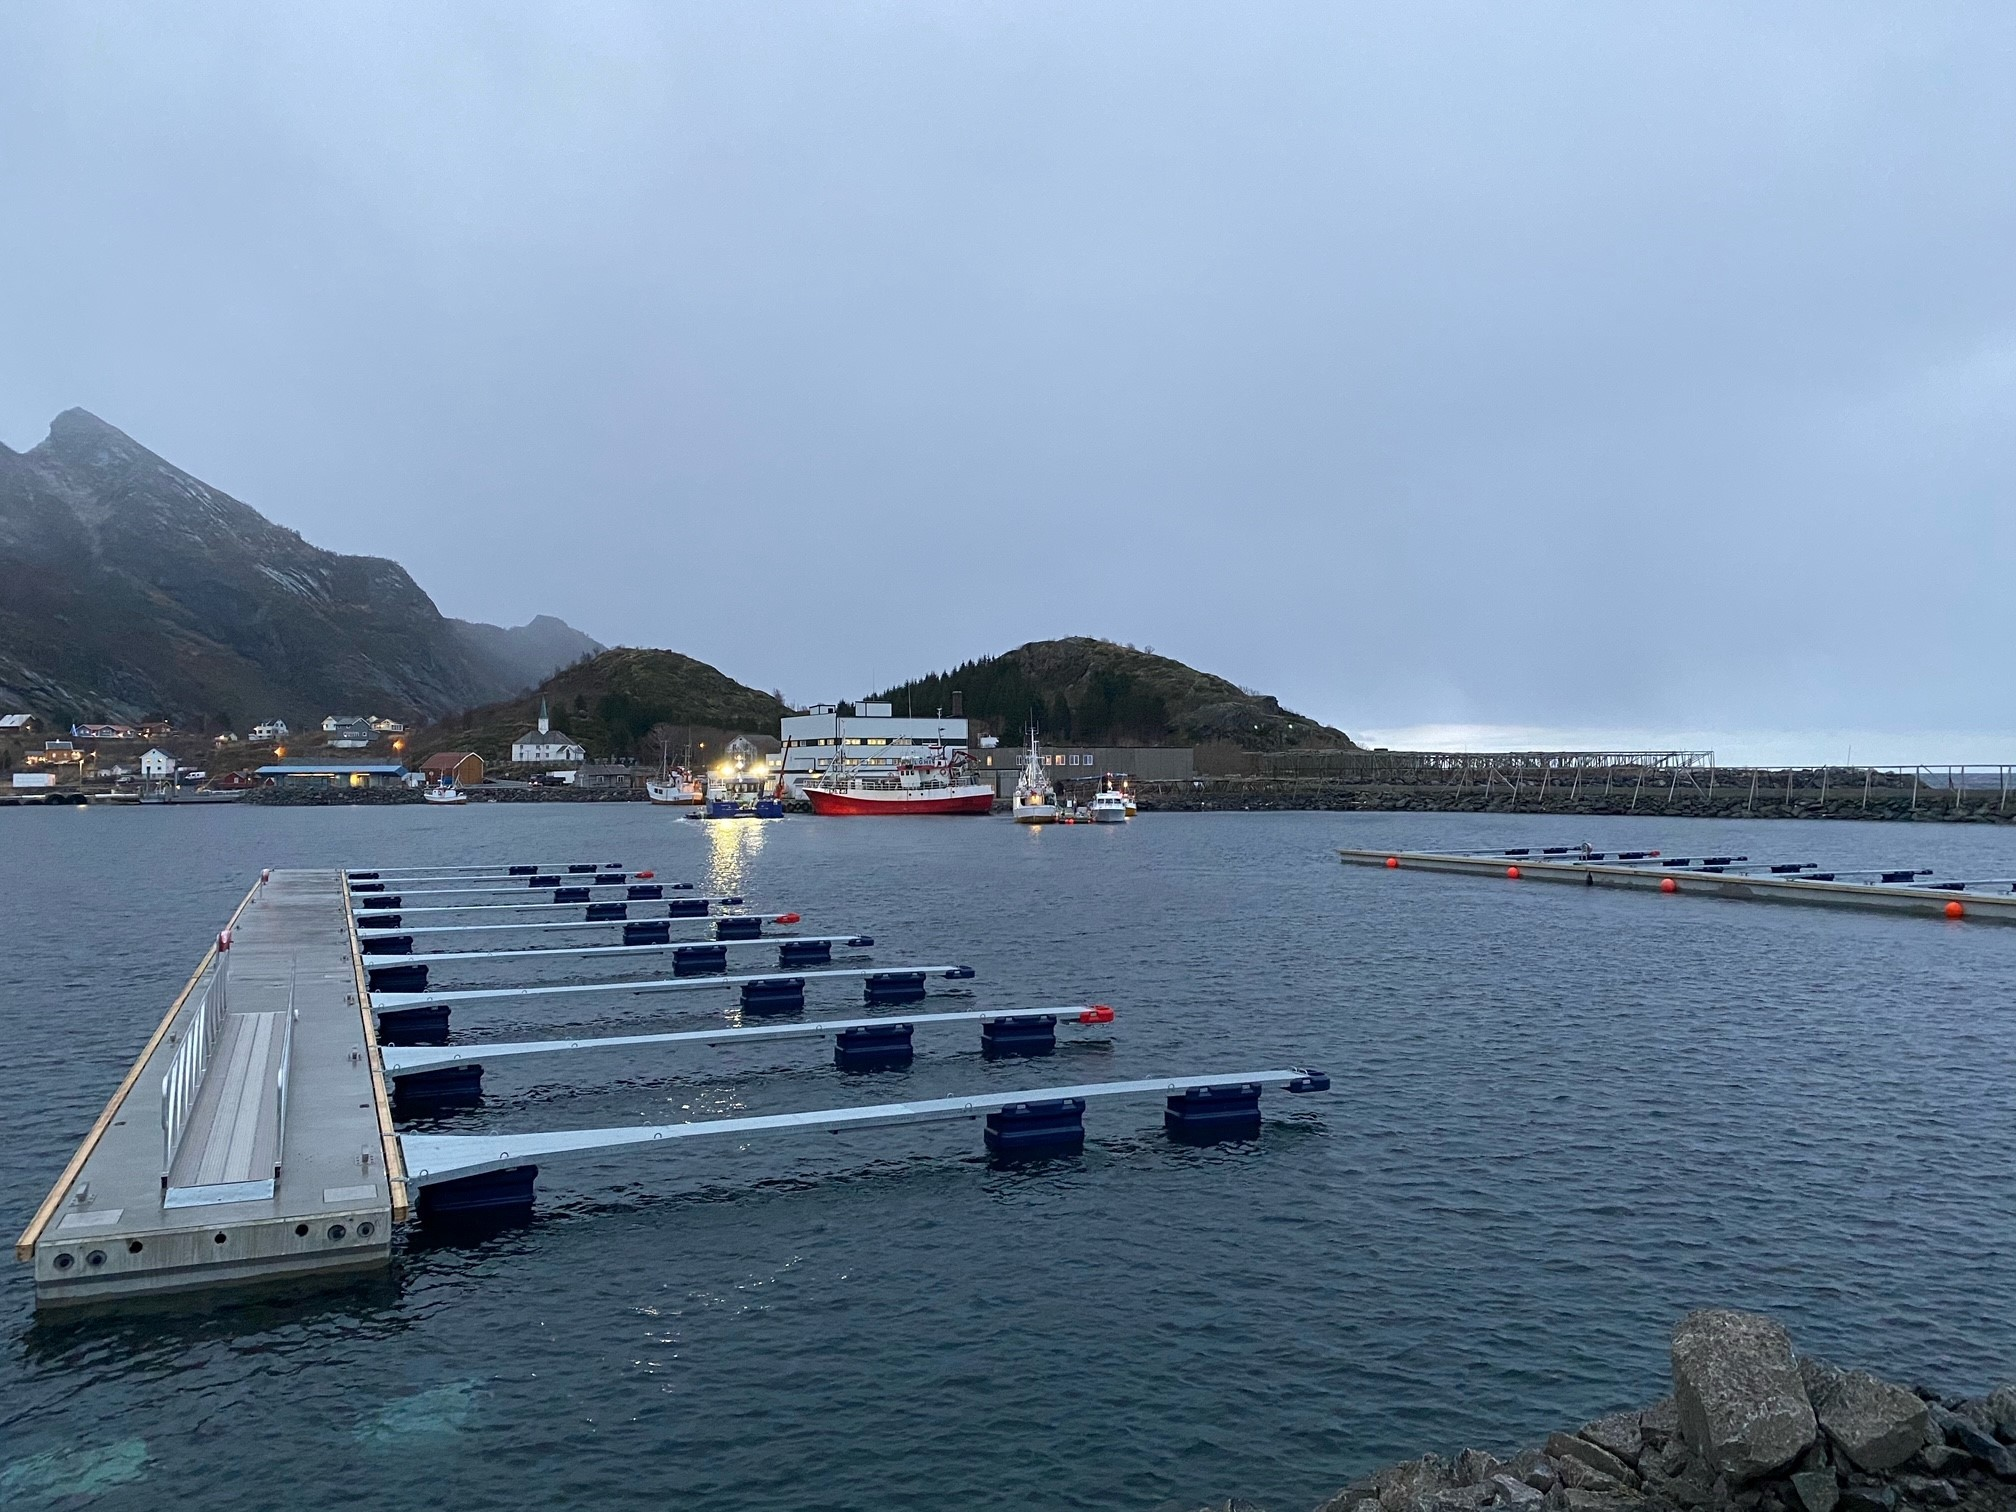 https://marinasolutions.no/uploads/Moskenesvågen-Fiskebåtlag_betongbrygger-og-utriggere-2.jpg